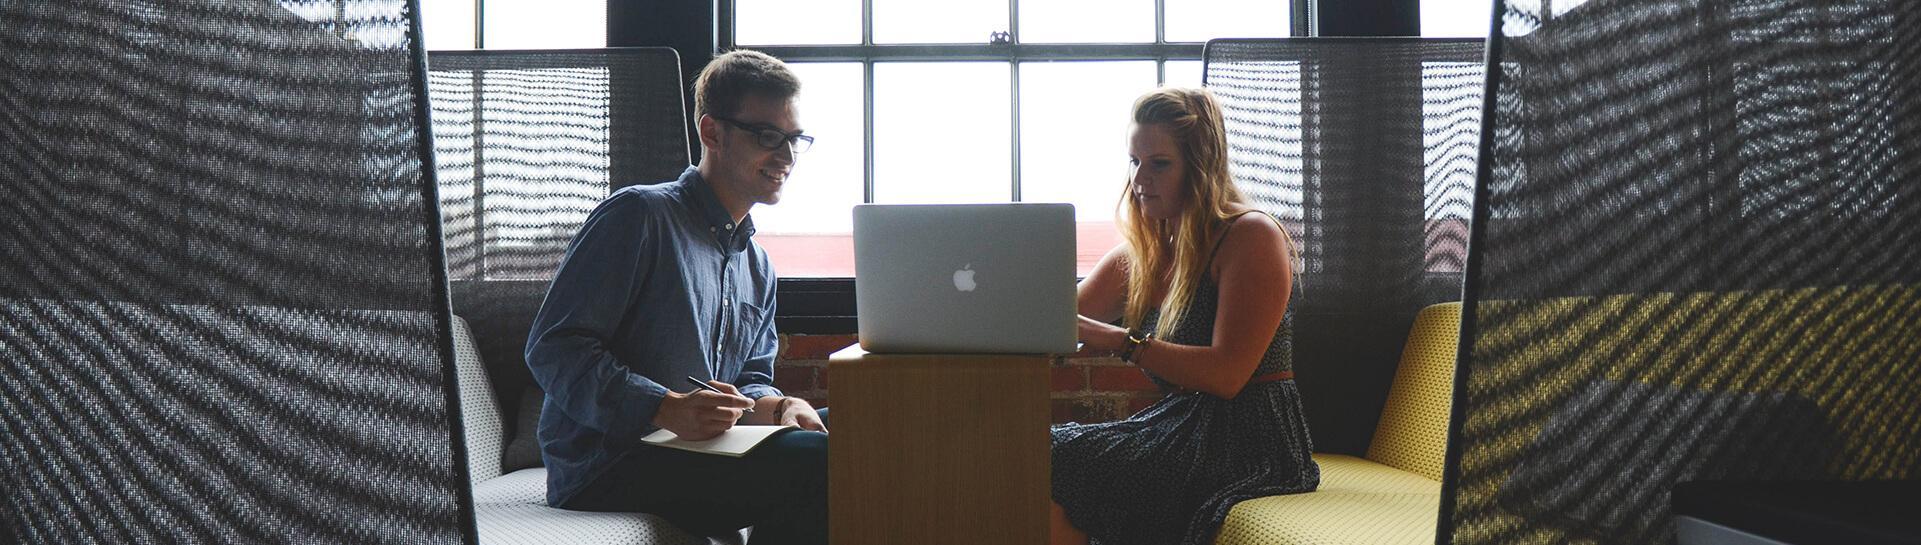 Digital Marketing students looking at laptop - Tulane School of Professional Advancement